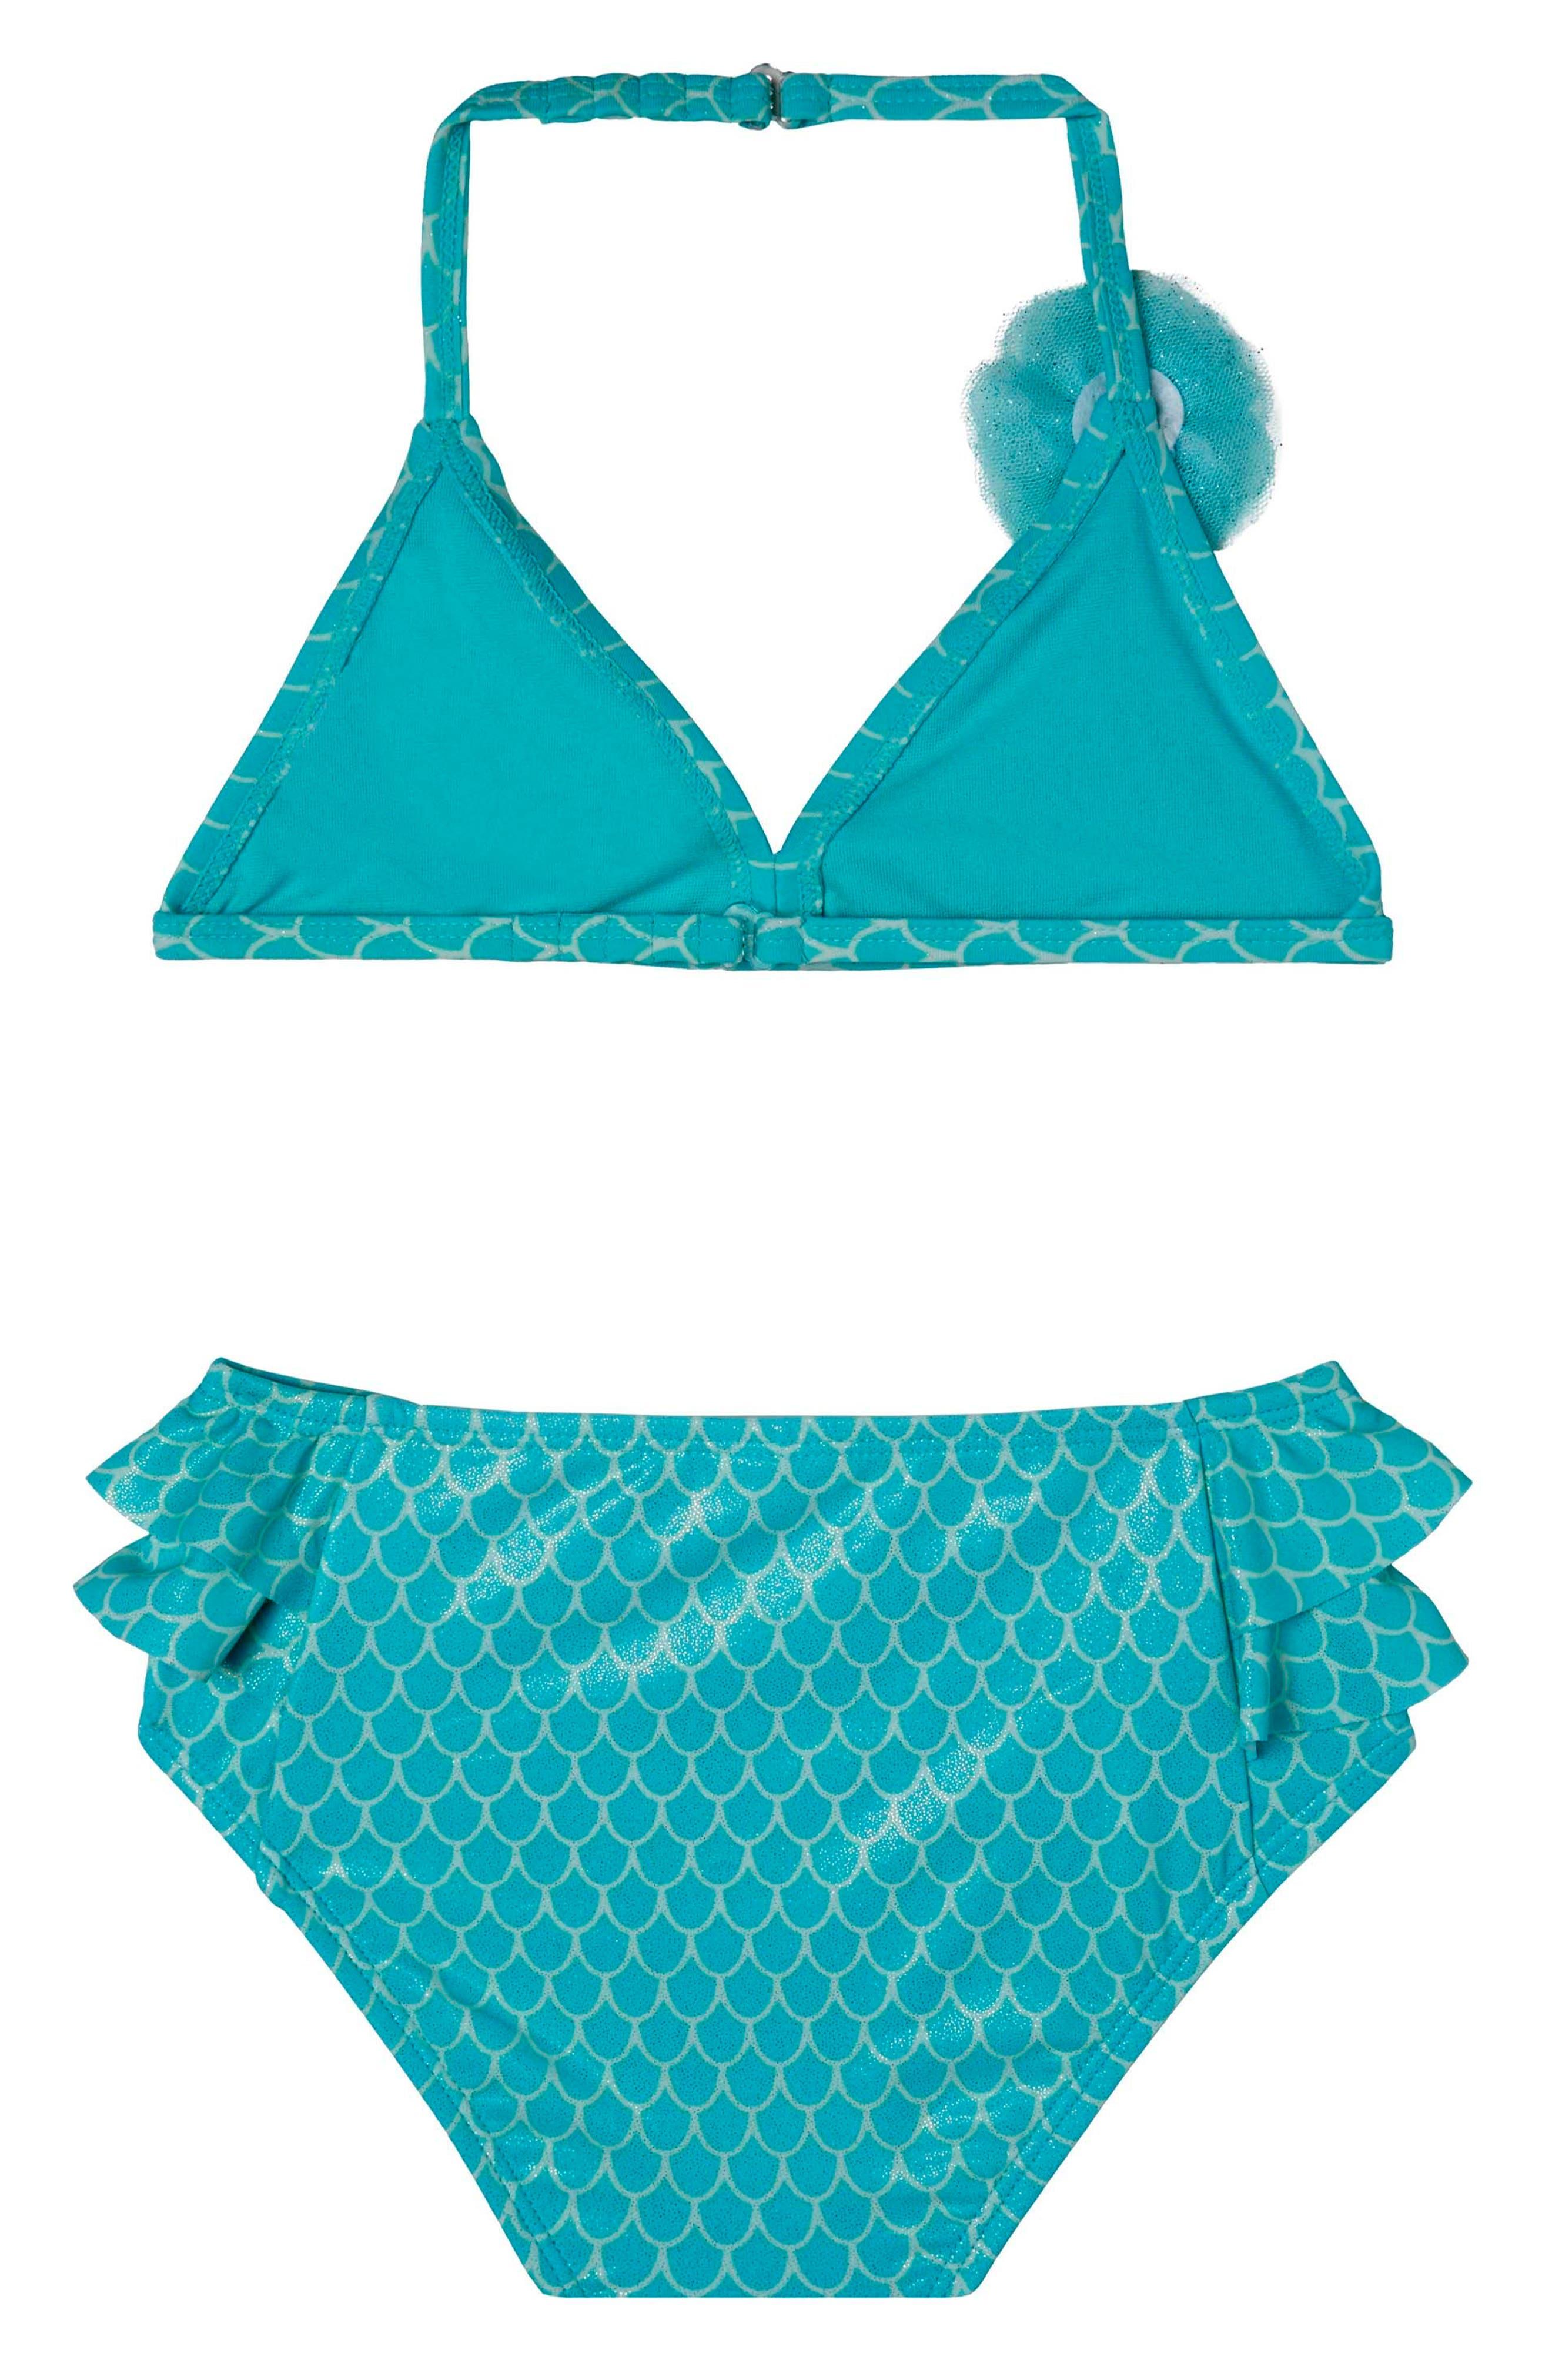 Mermaid Princess Two-Piece Swimsuit,                             Main thumbnail 1, color,                             400